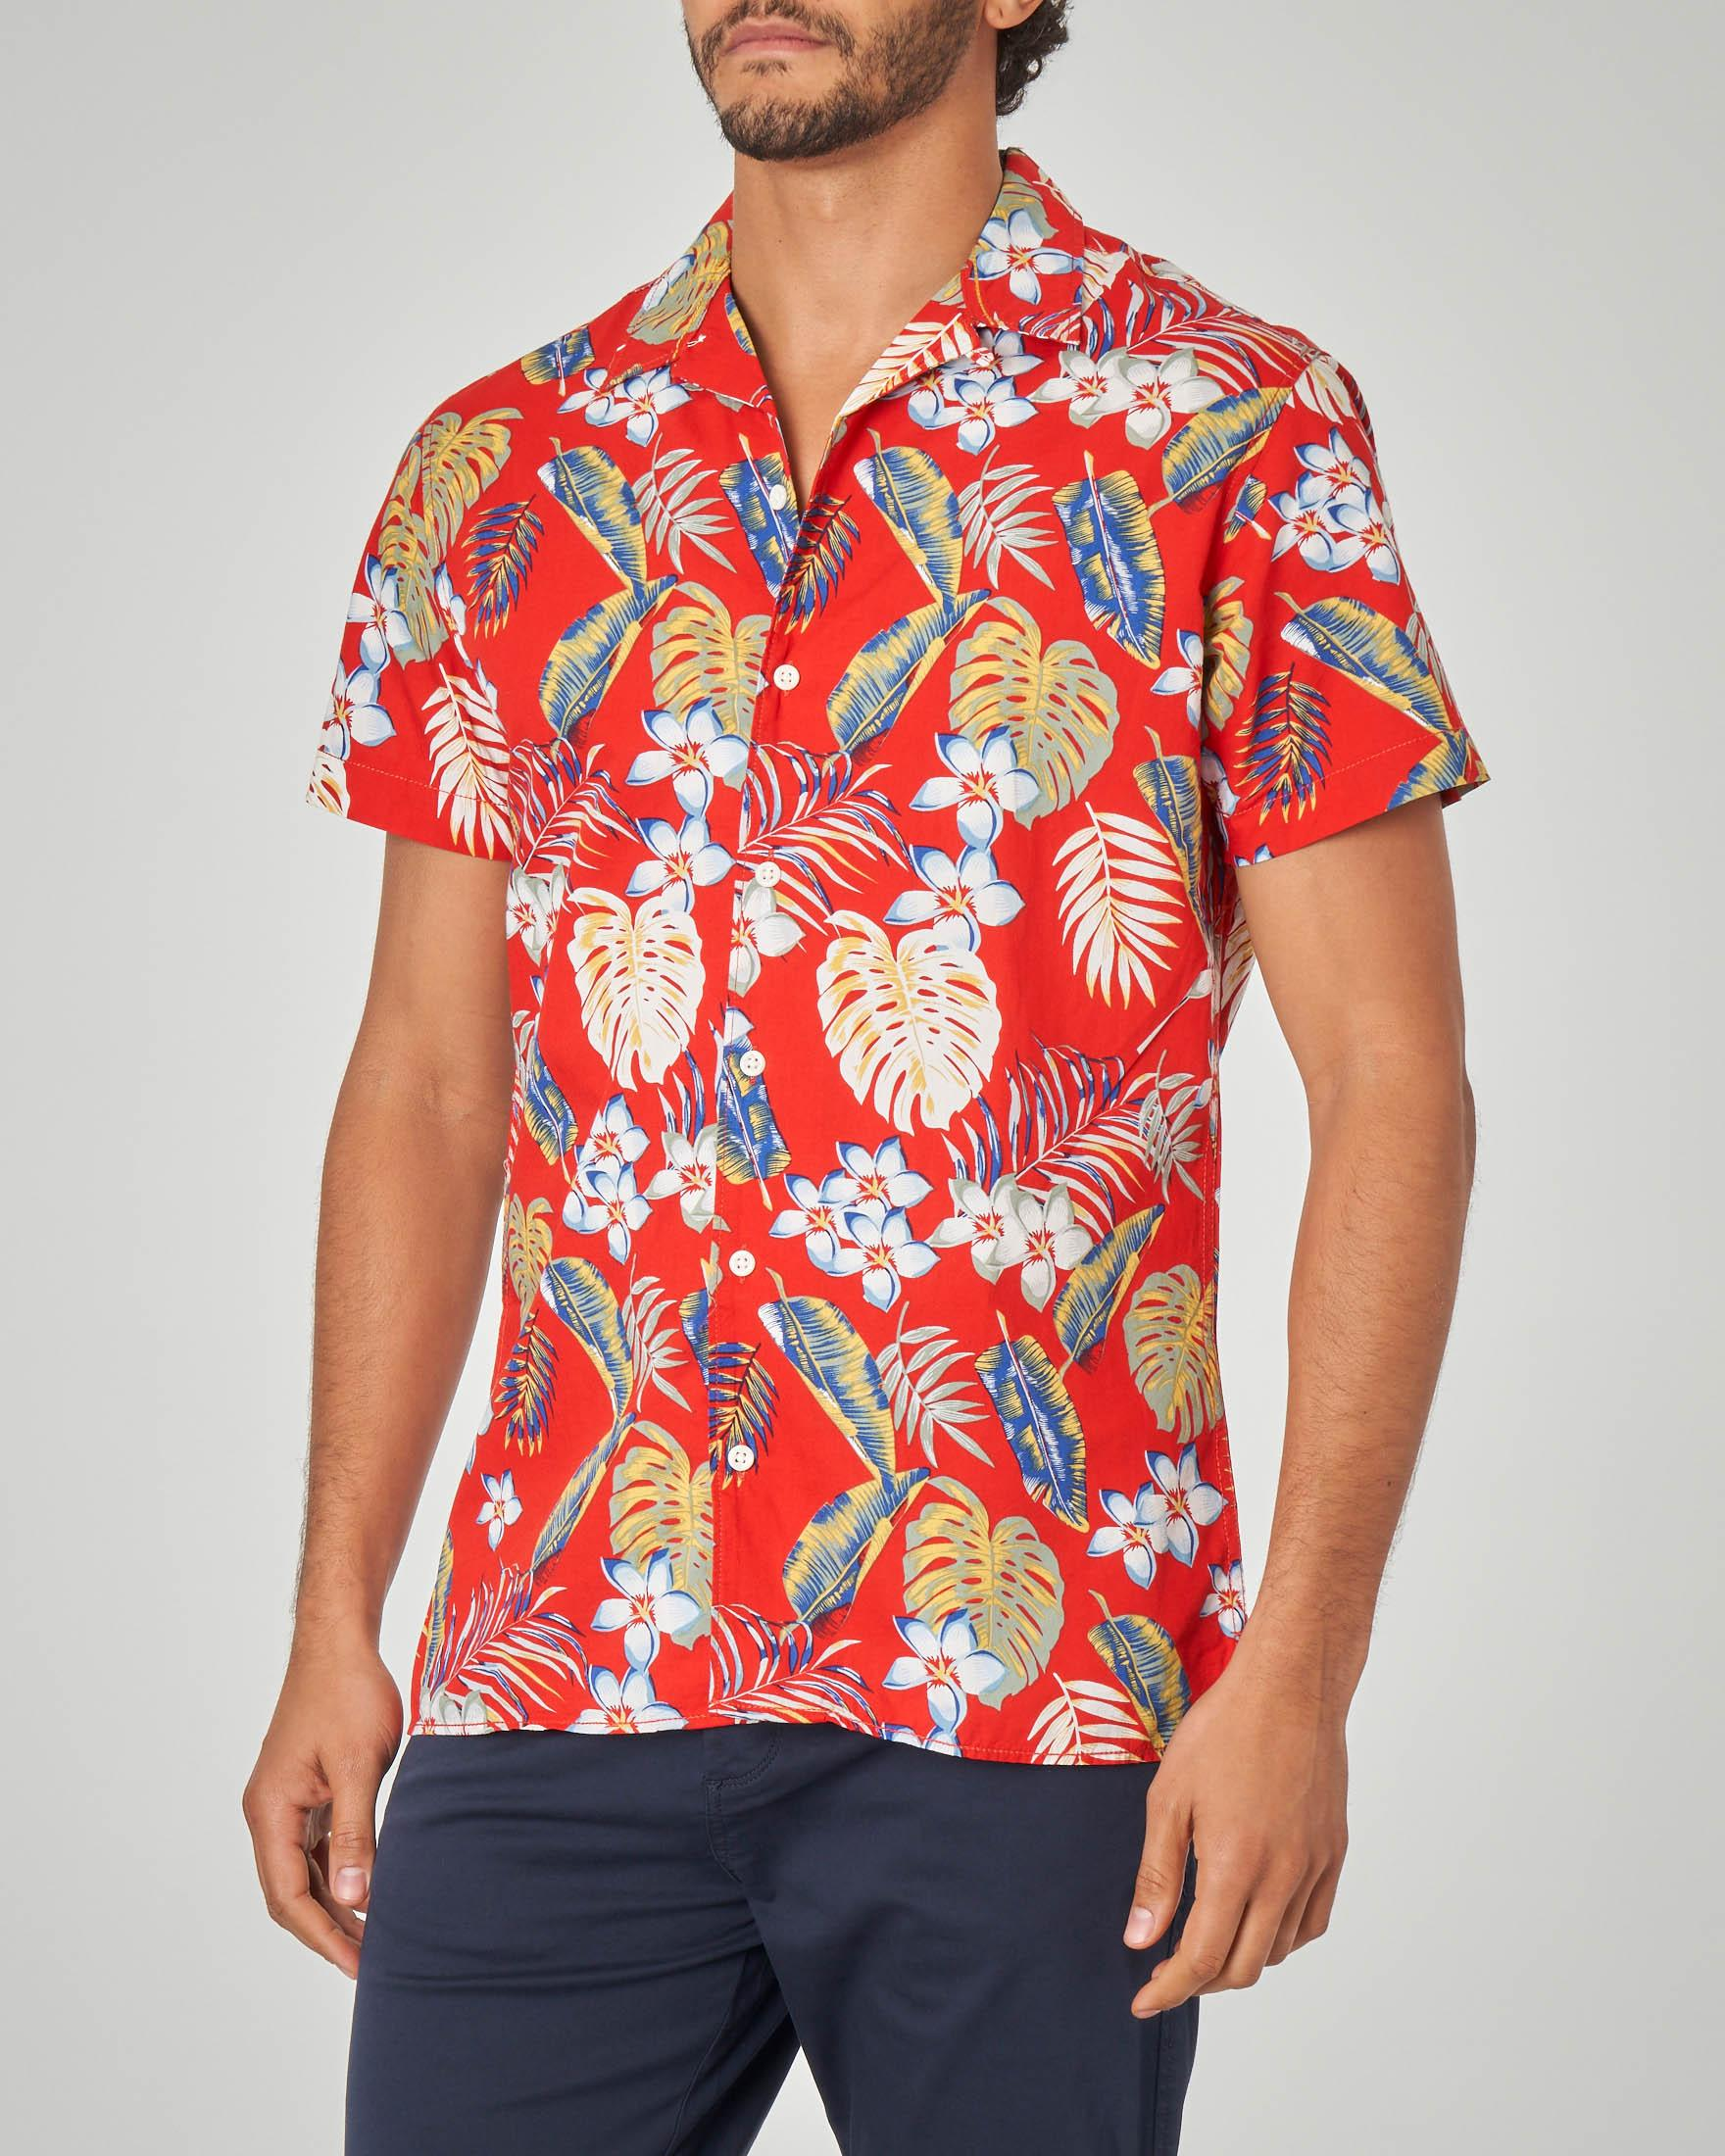 Camicia mezza manica rossa fantasia hawaiana